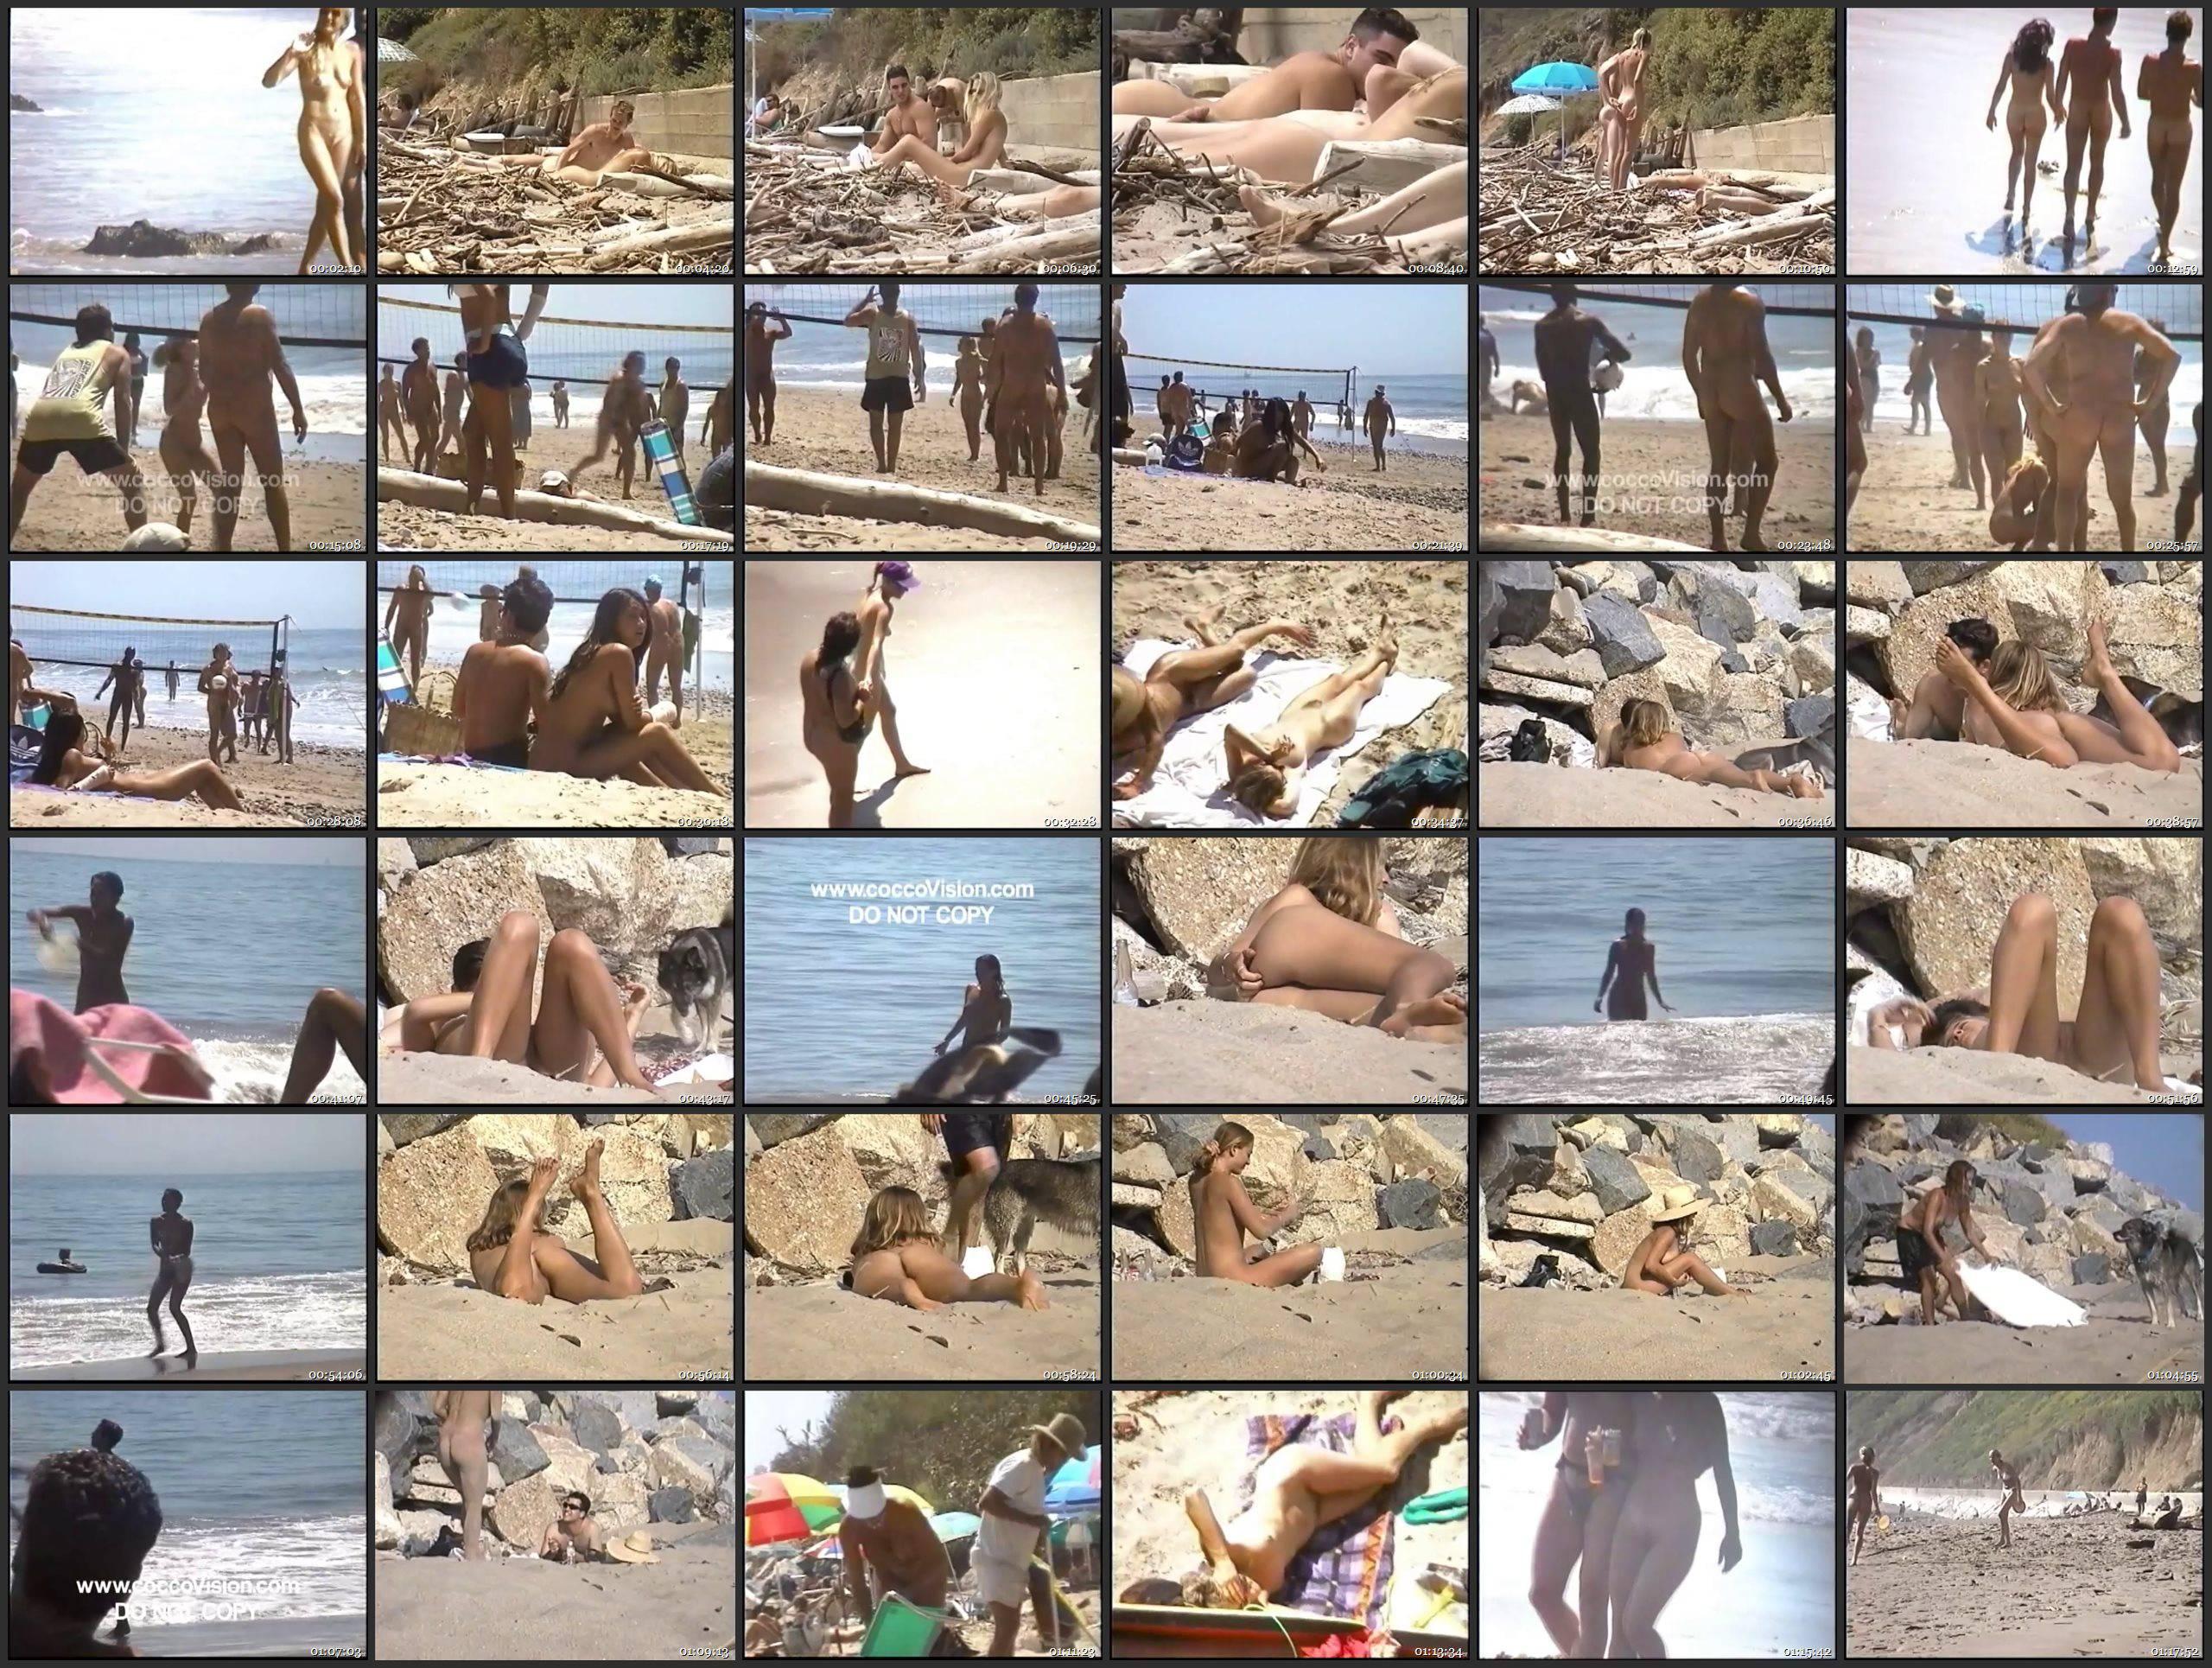 Nudist Movies-Brads California Dreamers 1 - Thumbnails